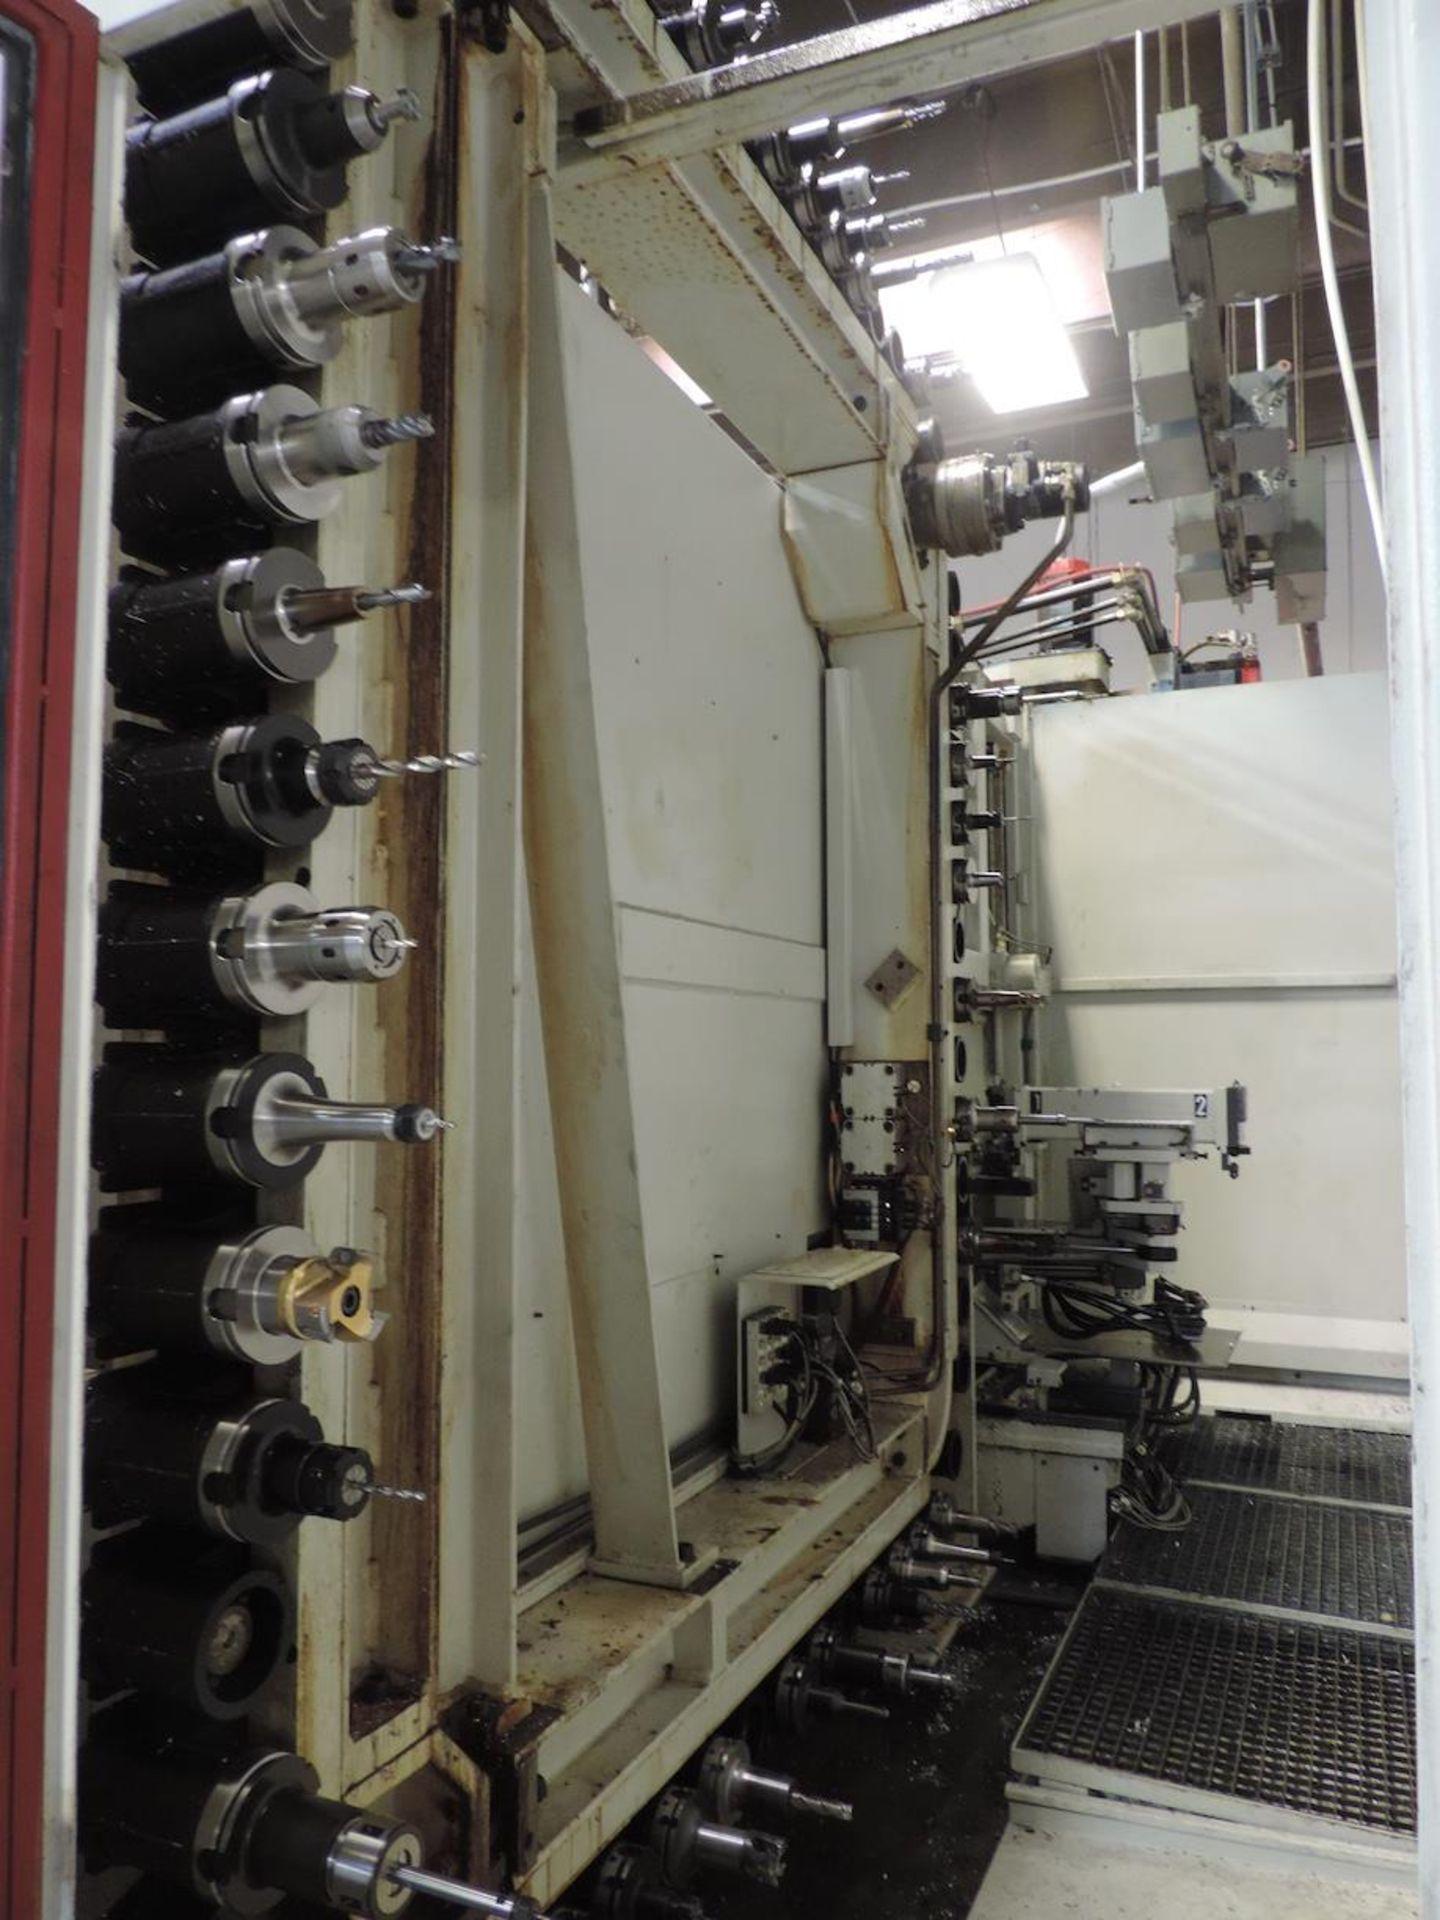 "2002 STARRAG & HECKERT CWK-630D HMC, GE FANUC 16i-M CONTROL, XYZ TRAVELS: 41"" X 39"" X 45"", 24.8"" X - Image 18 of 20"